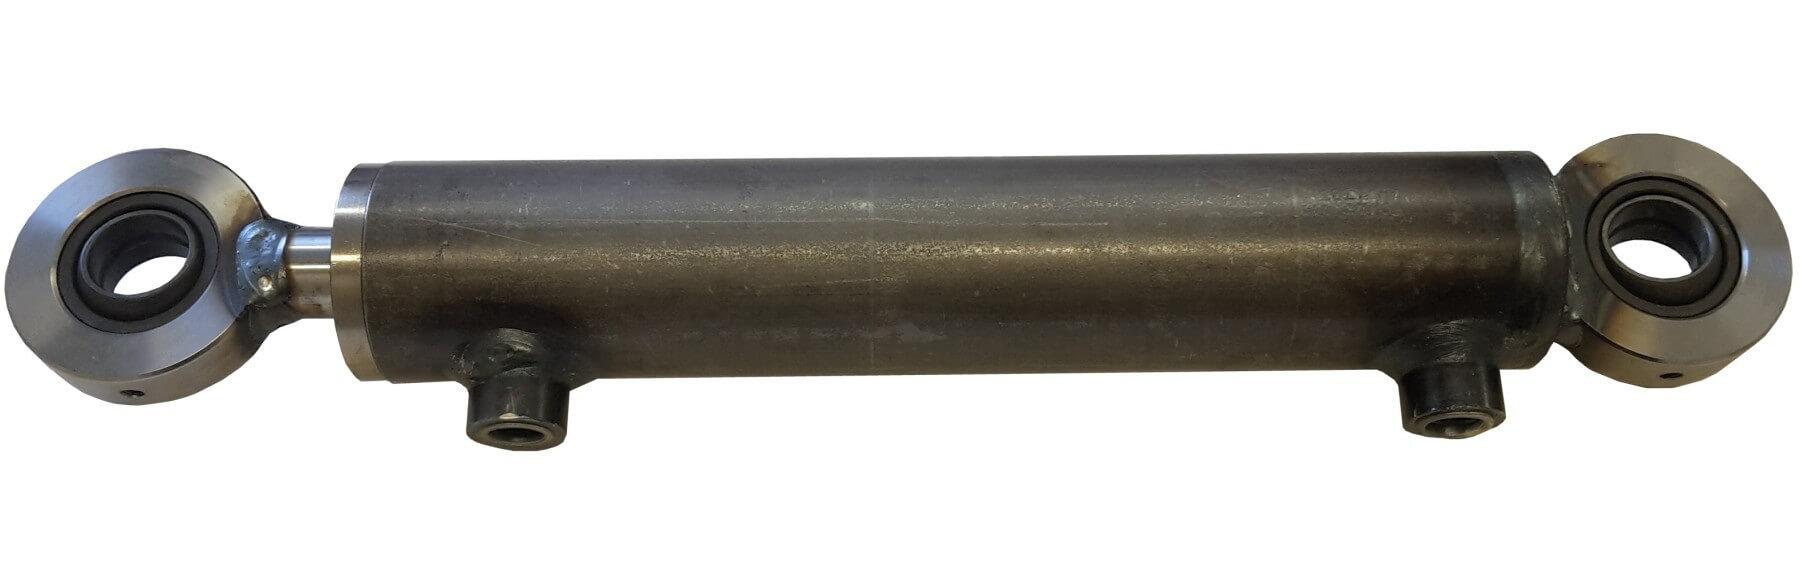 Hydraulisylinteri CL 60. 30. 200 GE